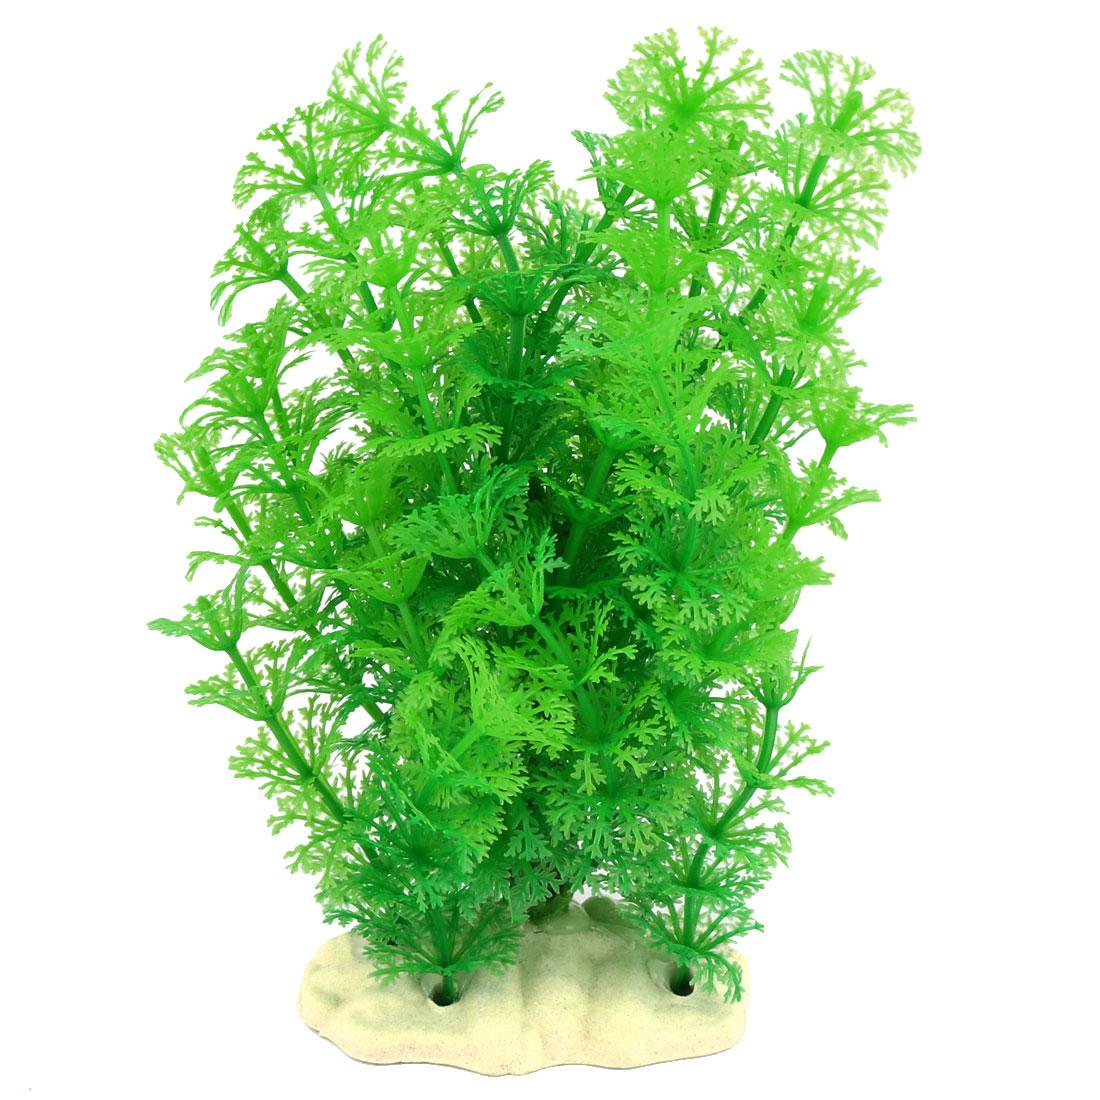 Aquarium Fish Tank Artificial Landscape Plant Tree Decoration Green 20cm Height